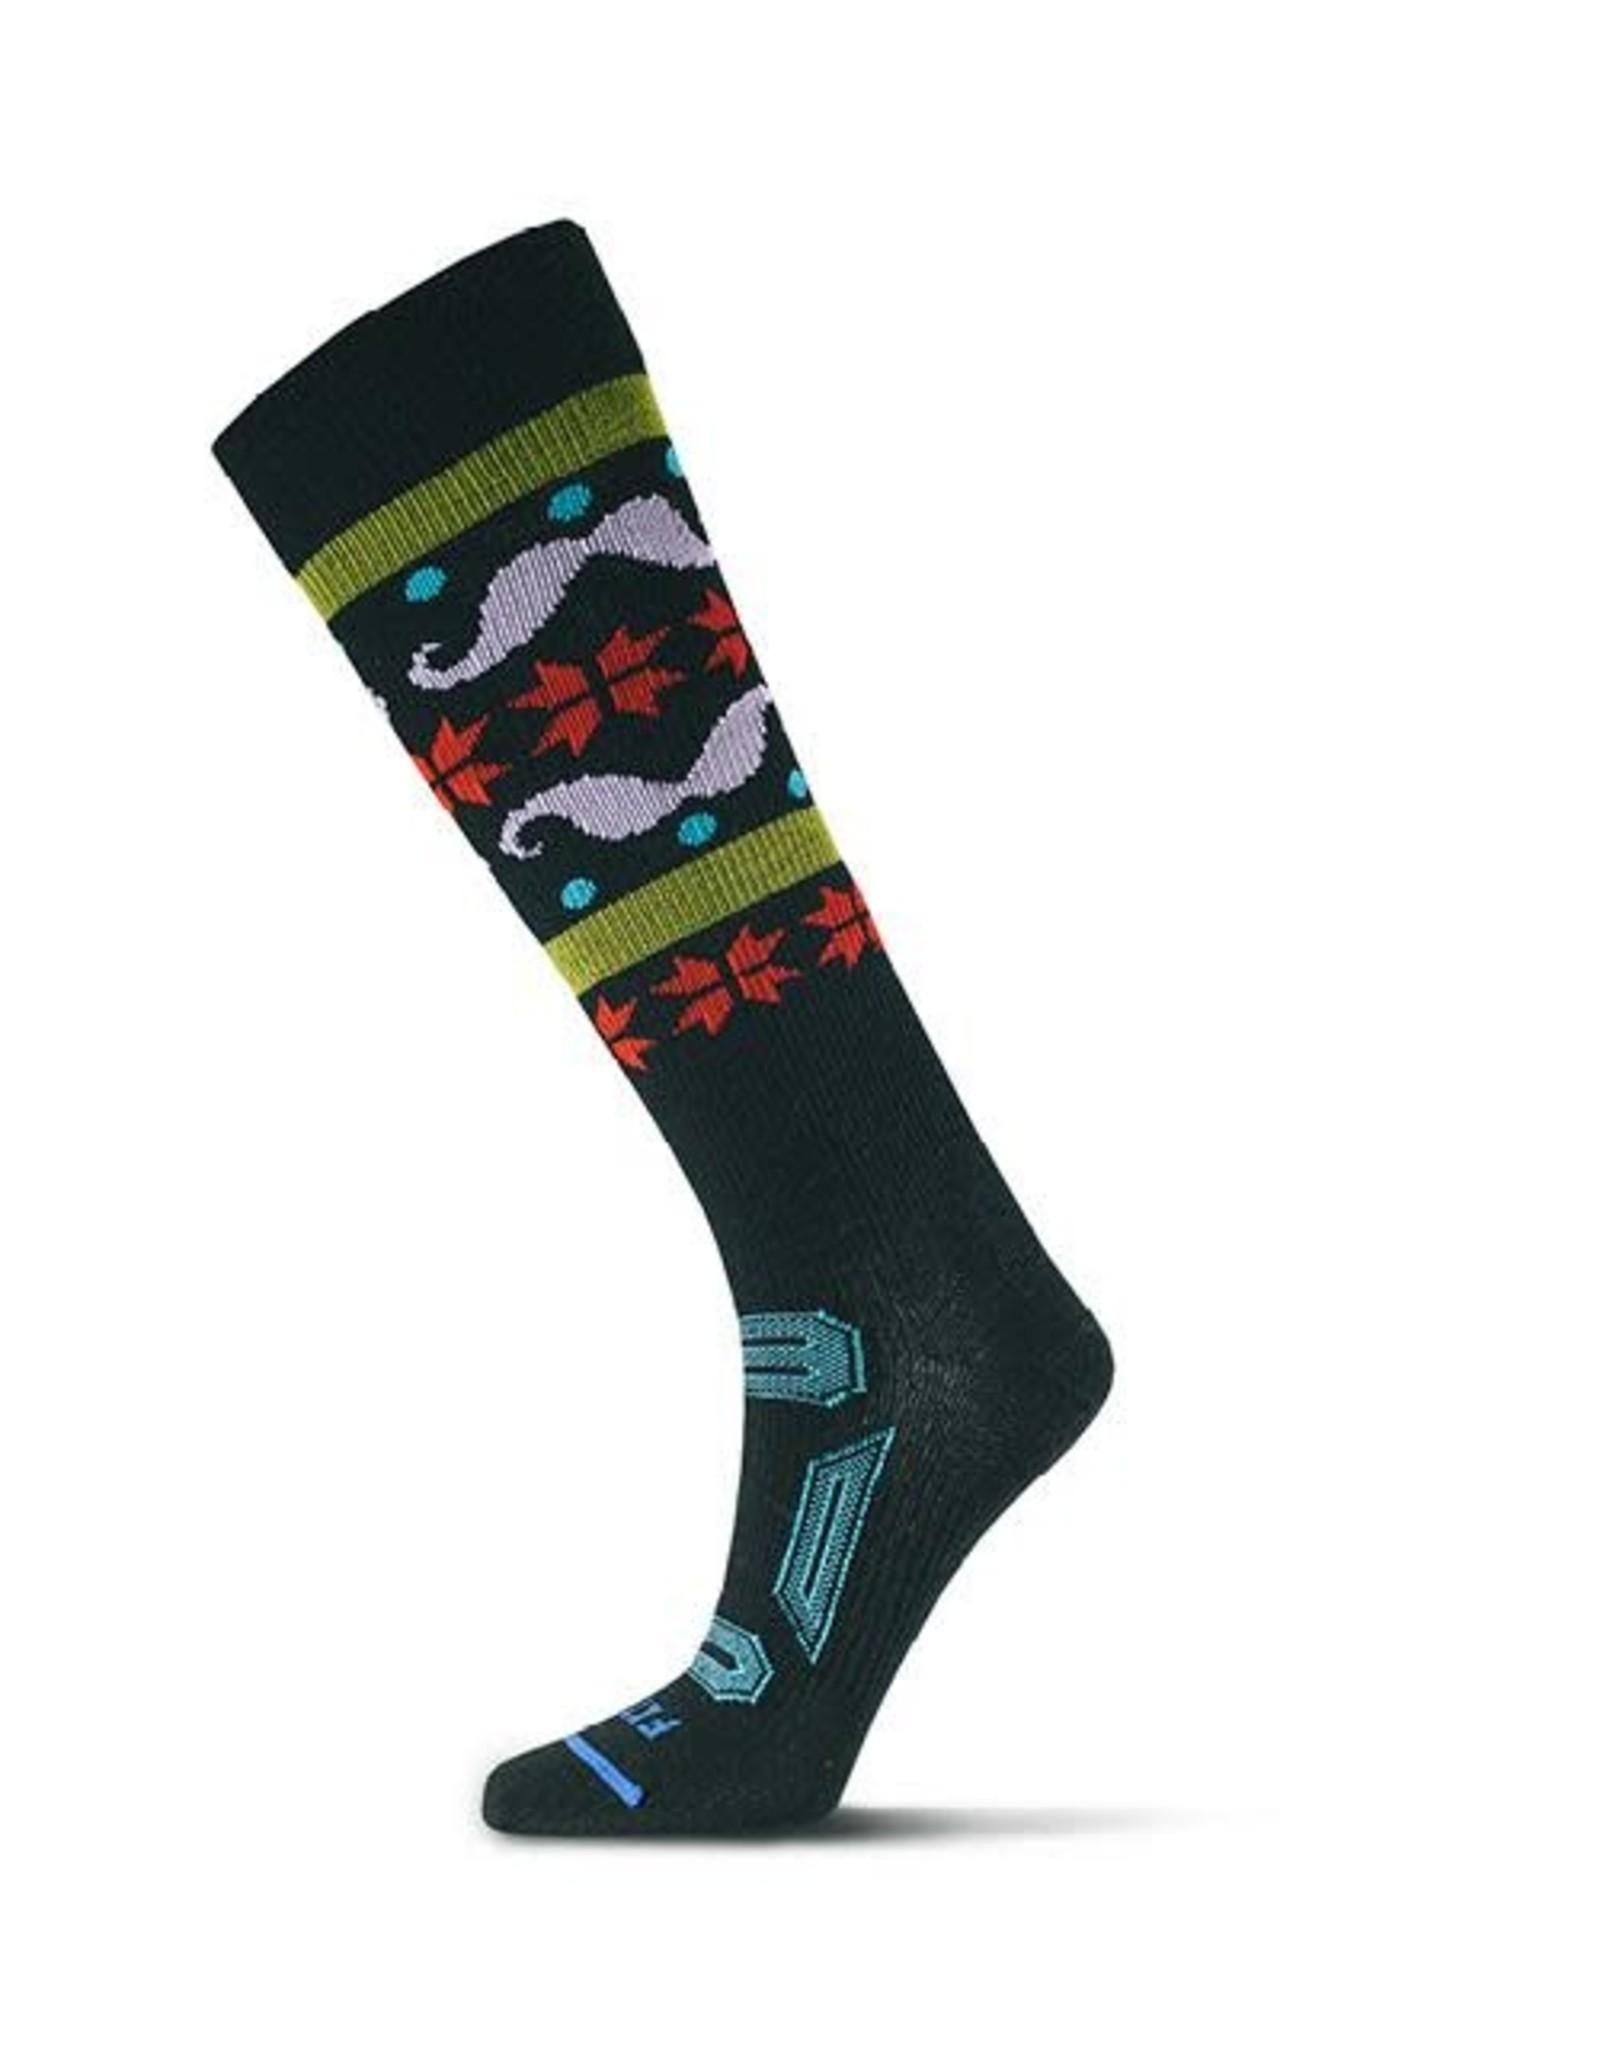 FITS FITS Ultra Light Ski Sock OTC